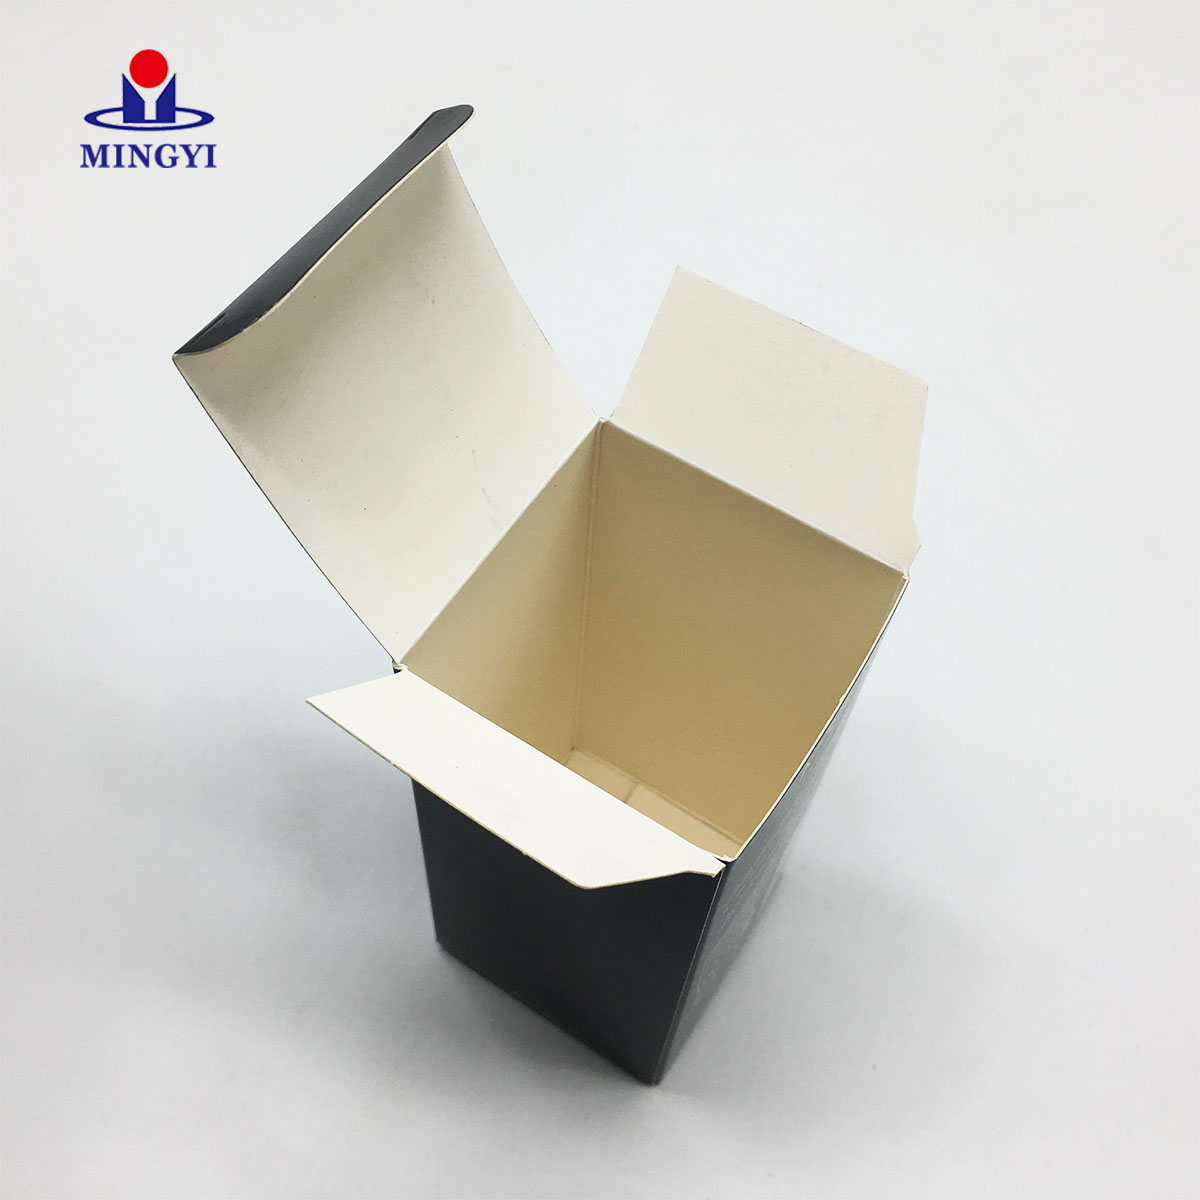 Mingyi Printing Array image51